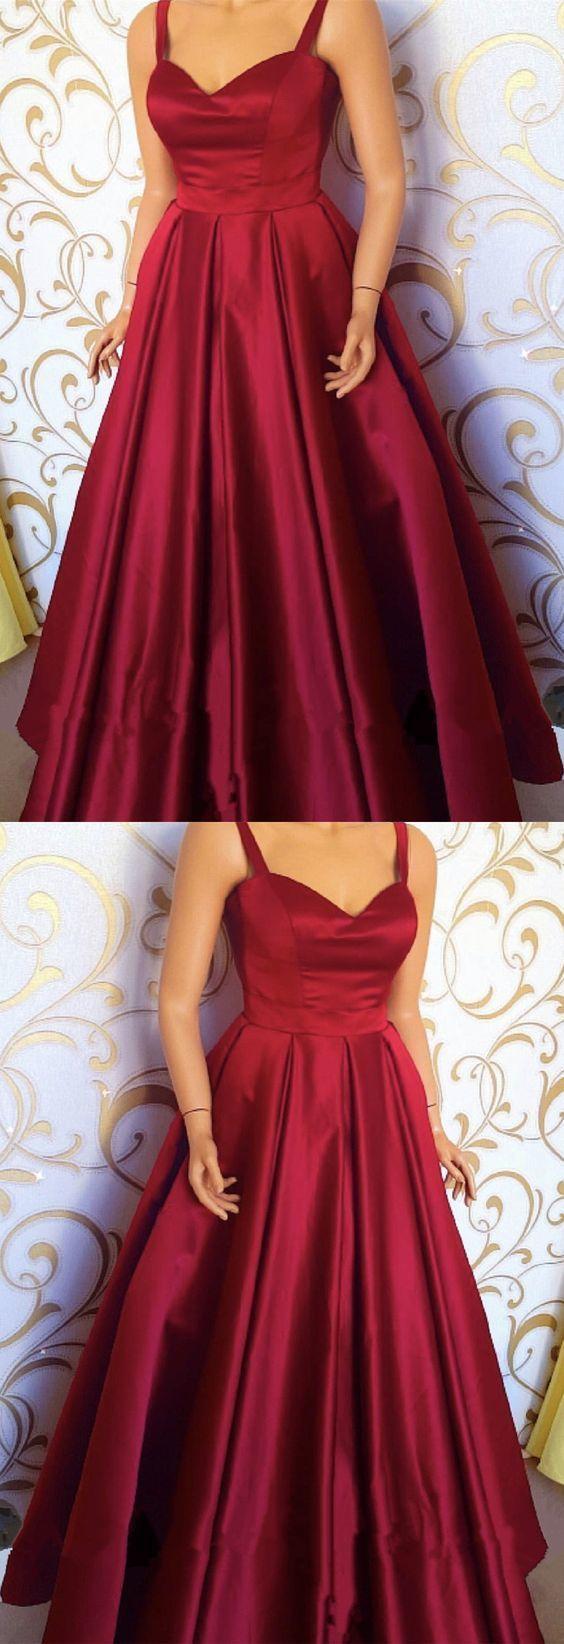 Red A Line Formal Evening Dress, Floor Length Long Prom Dresses